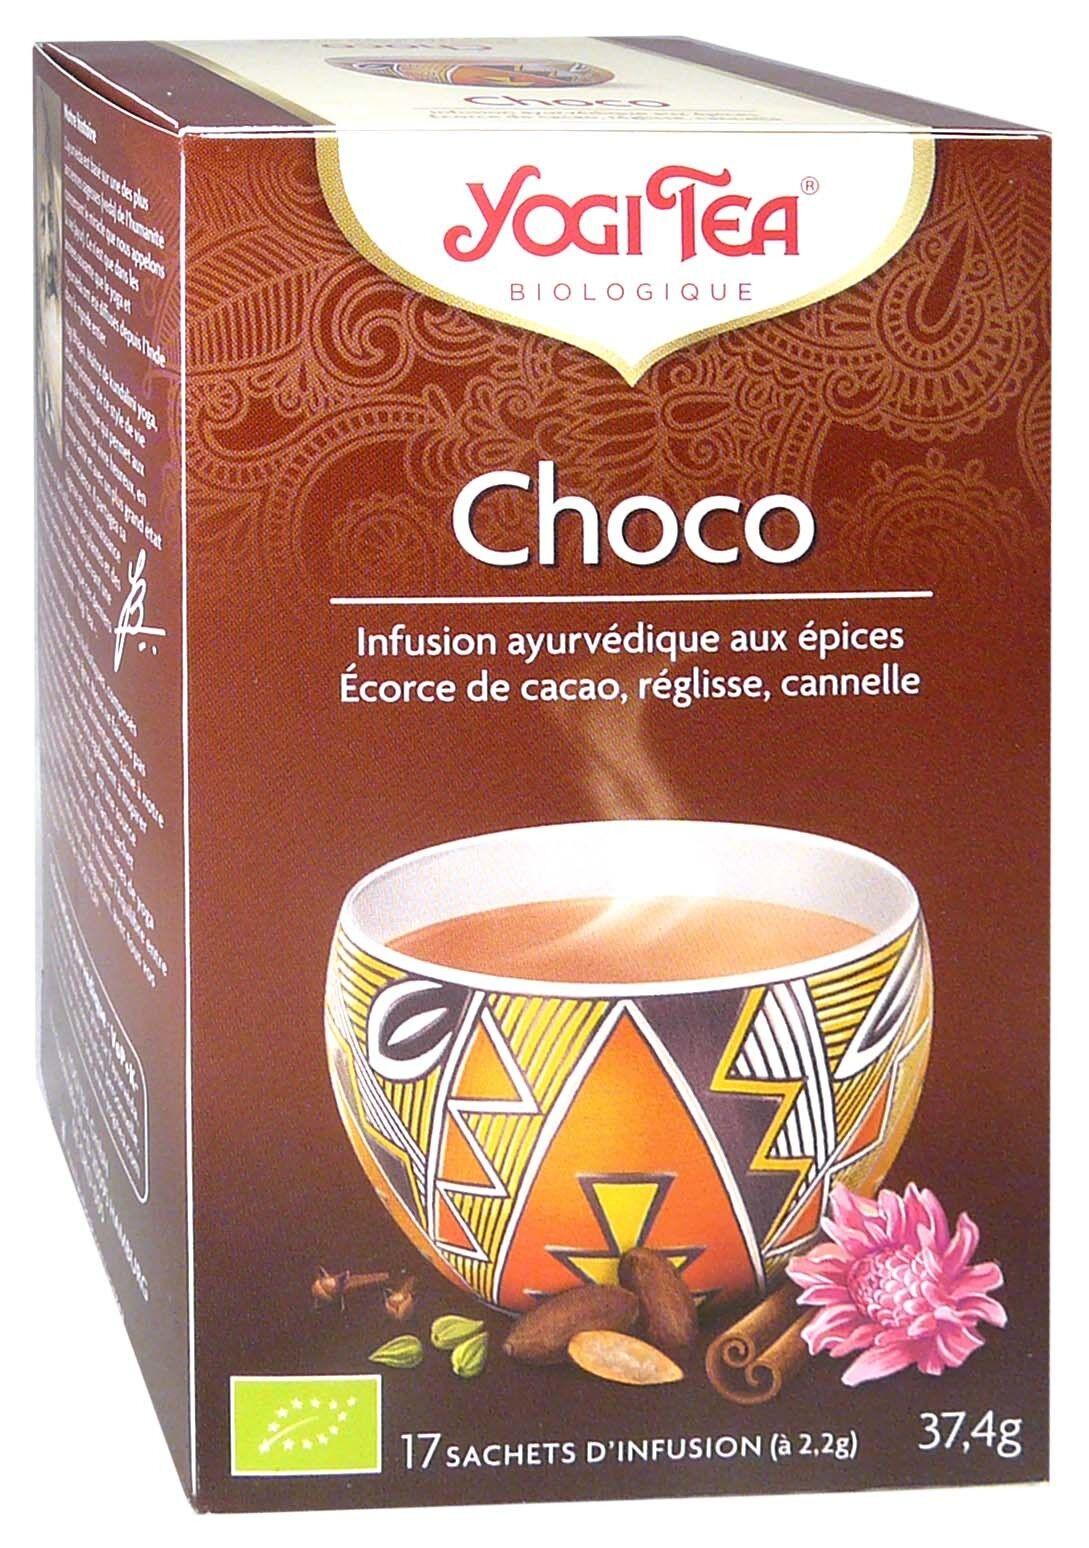 Yogi tea infusion choco x17 sachets